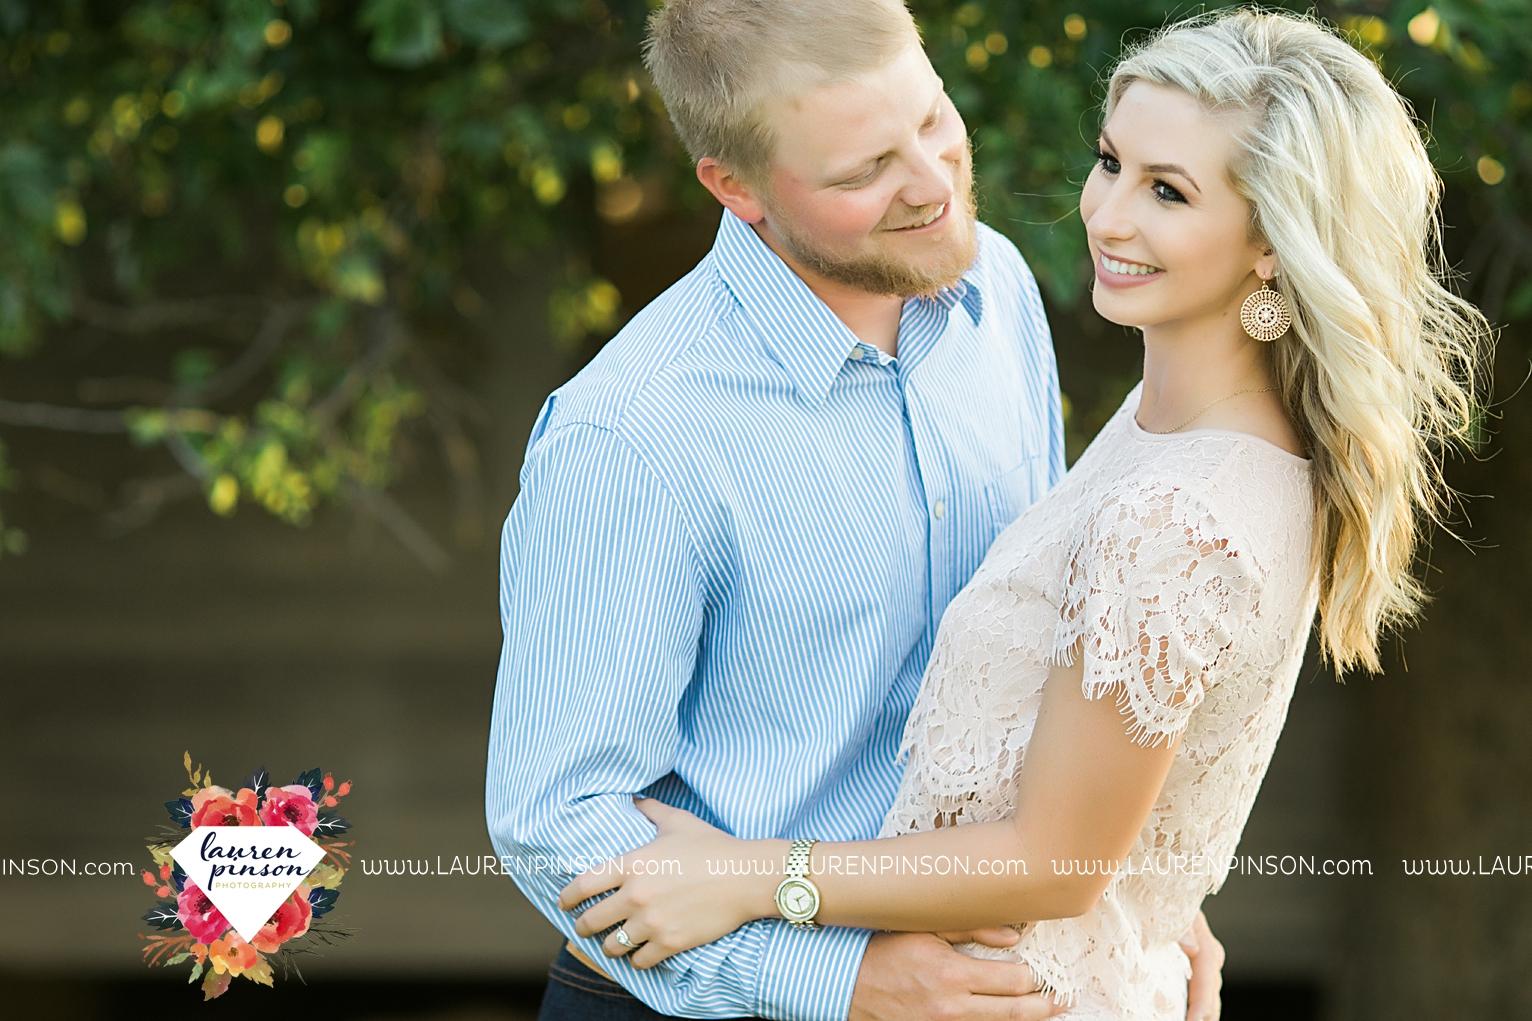 wichita-falls-texas-wedding-photographer-scotland-texas-engagement-session-country-barn-field-windthorst_2752.jpg